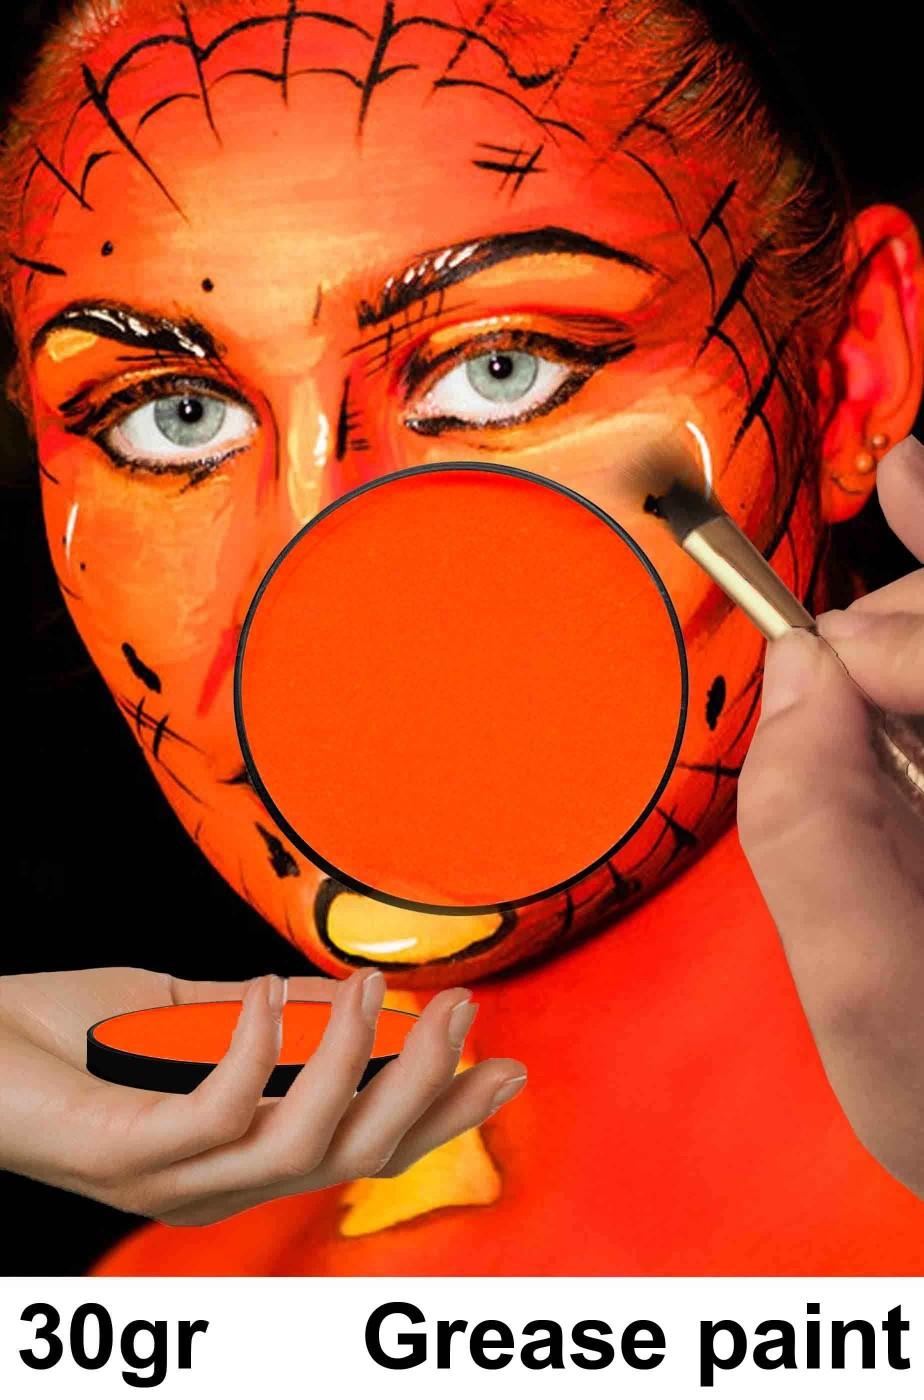 Trucco teatrale arancione zucca 30 gr